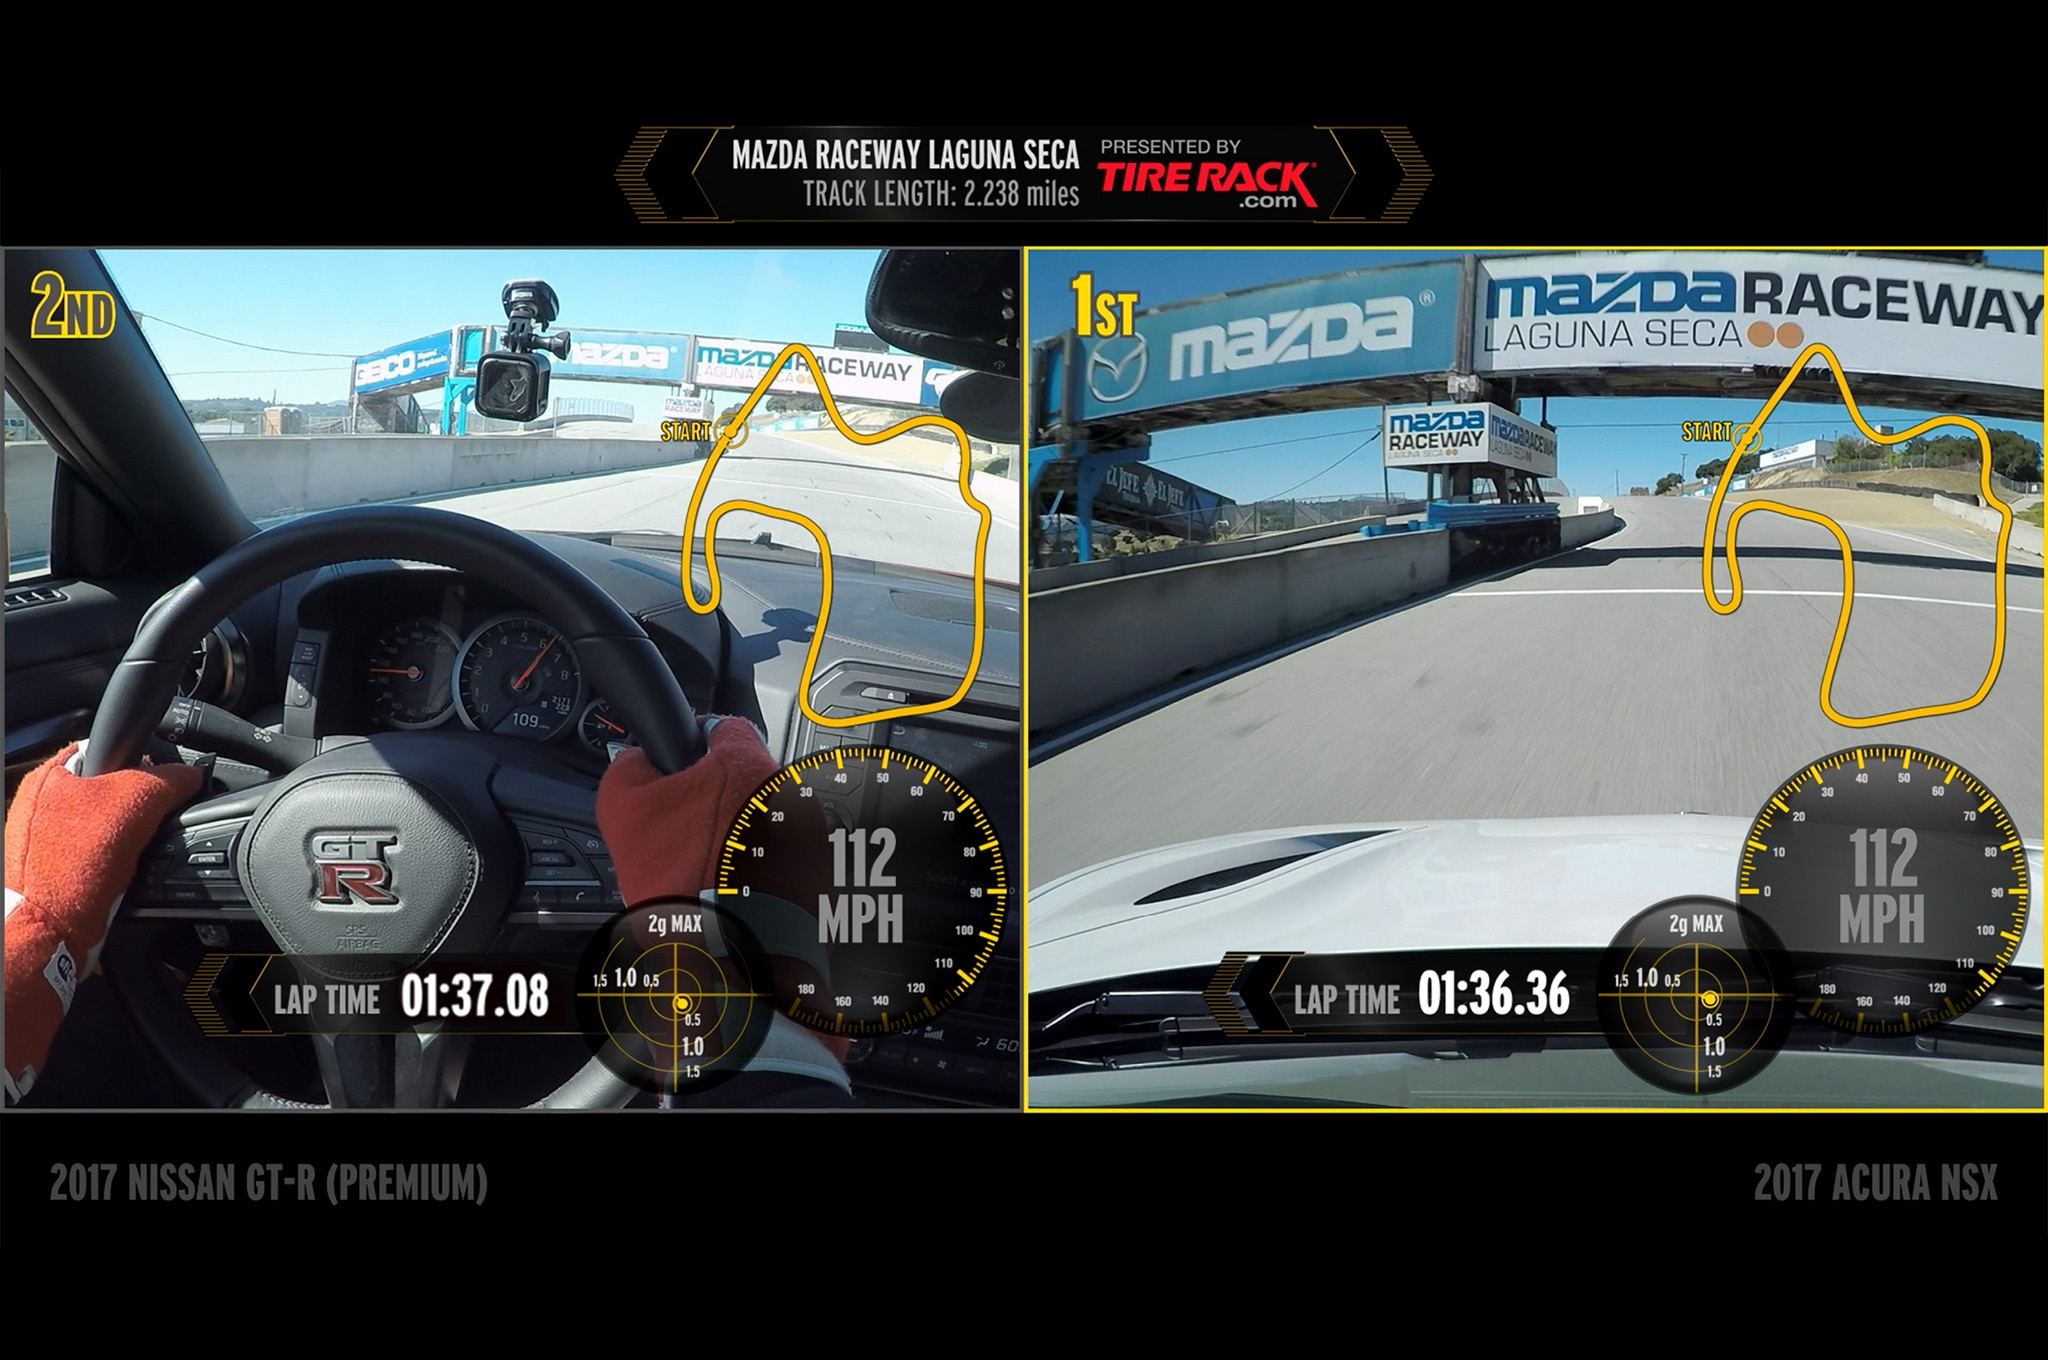 2017 Acura NSX vs 2017 Nissan GT R track times